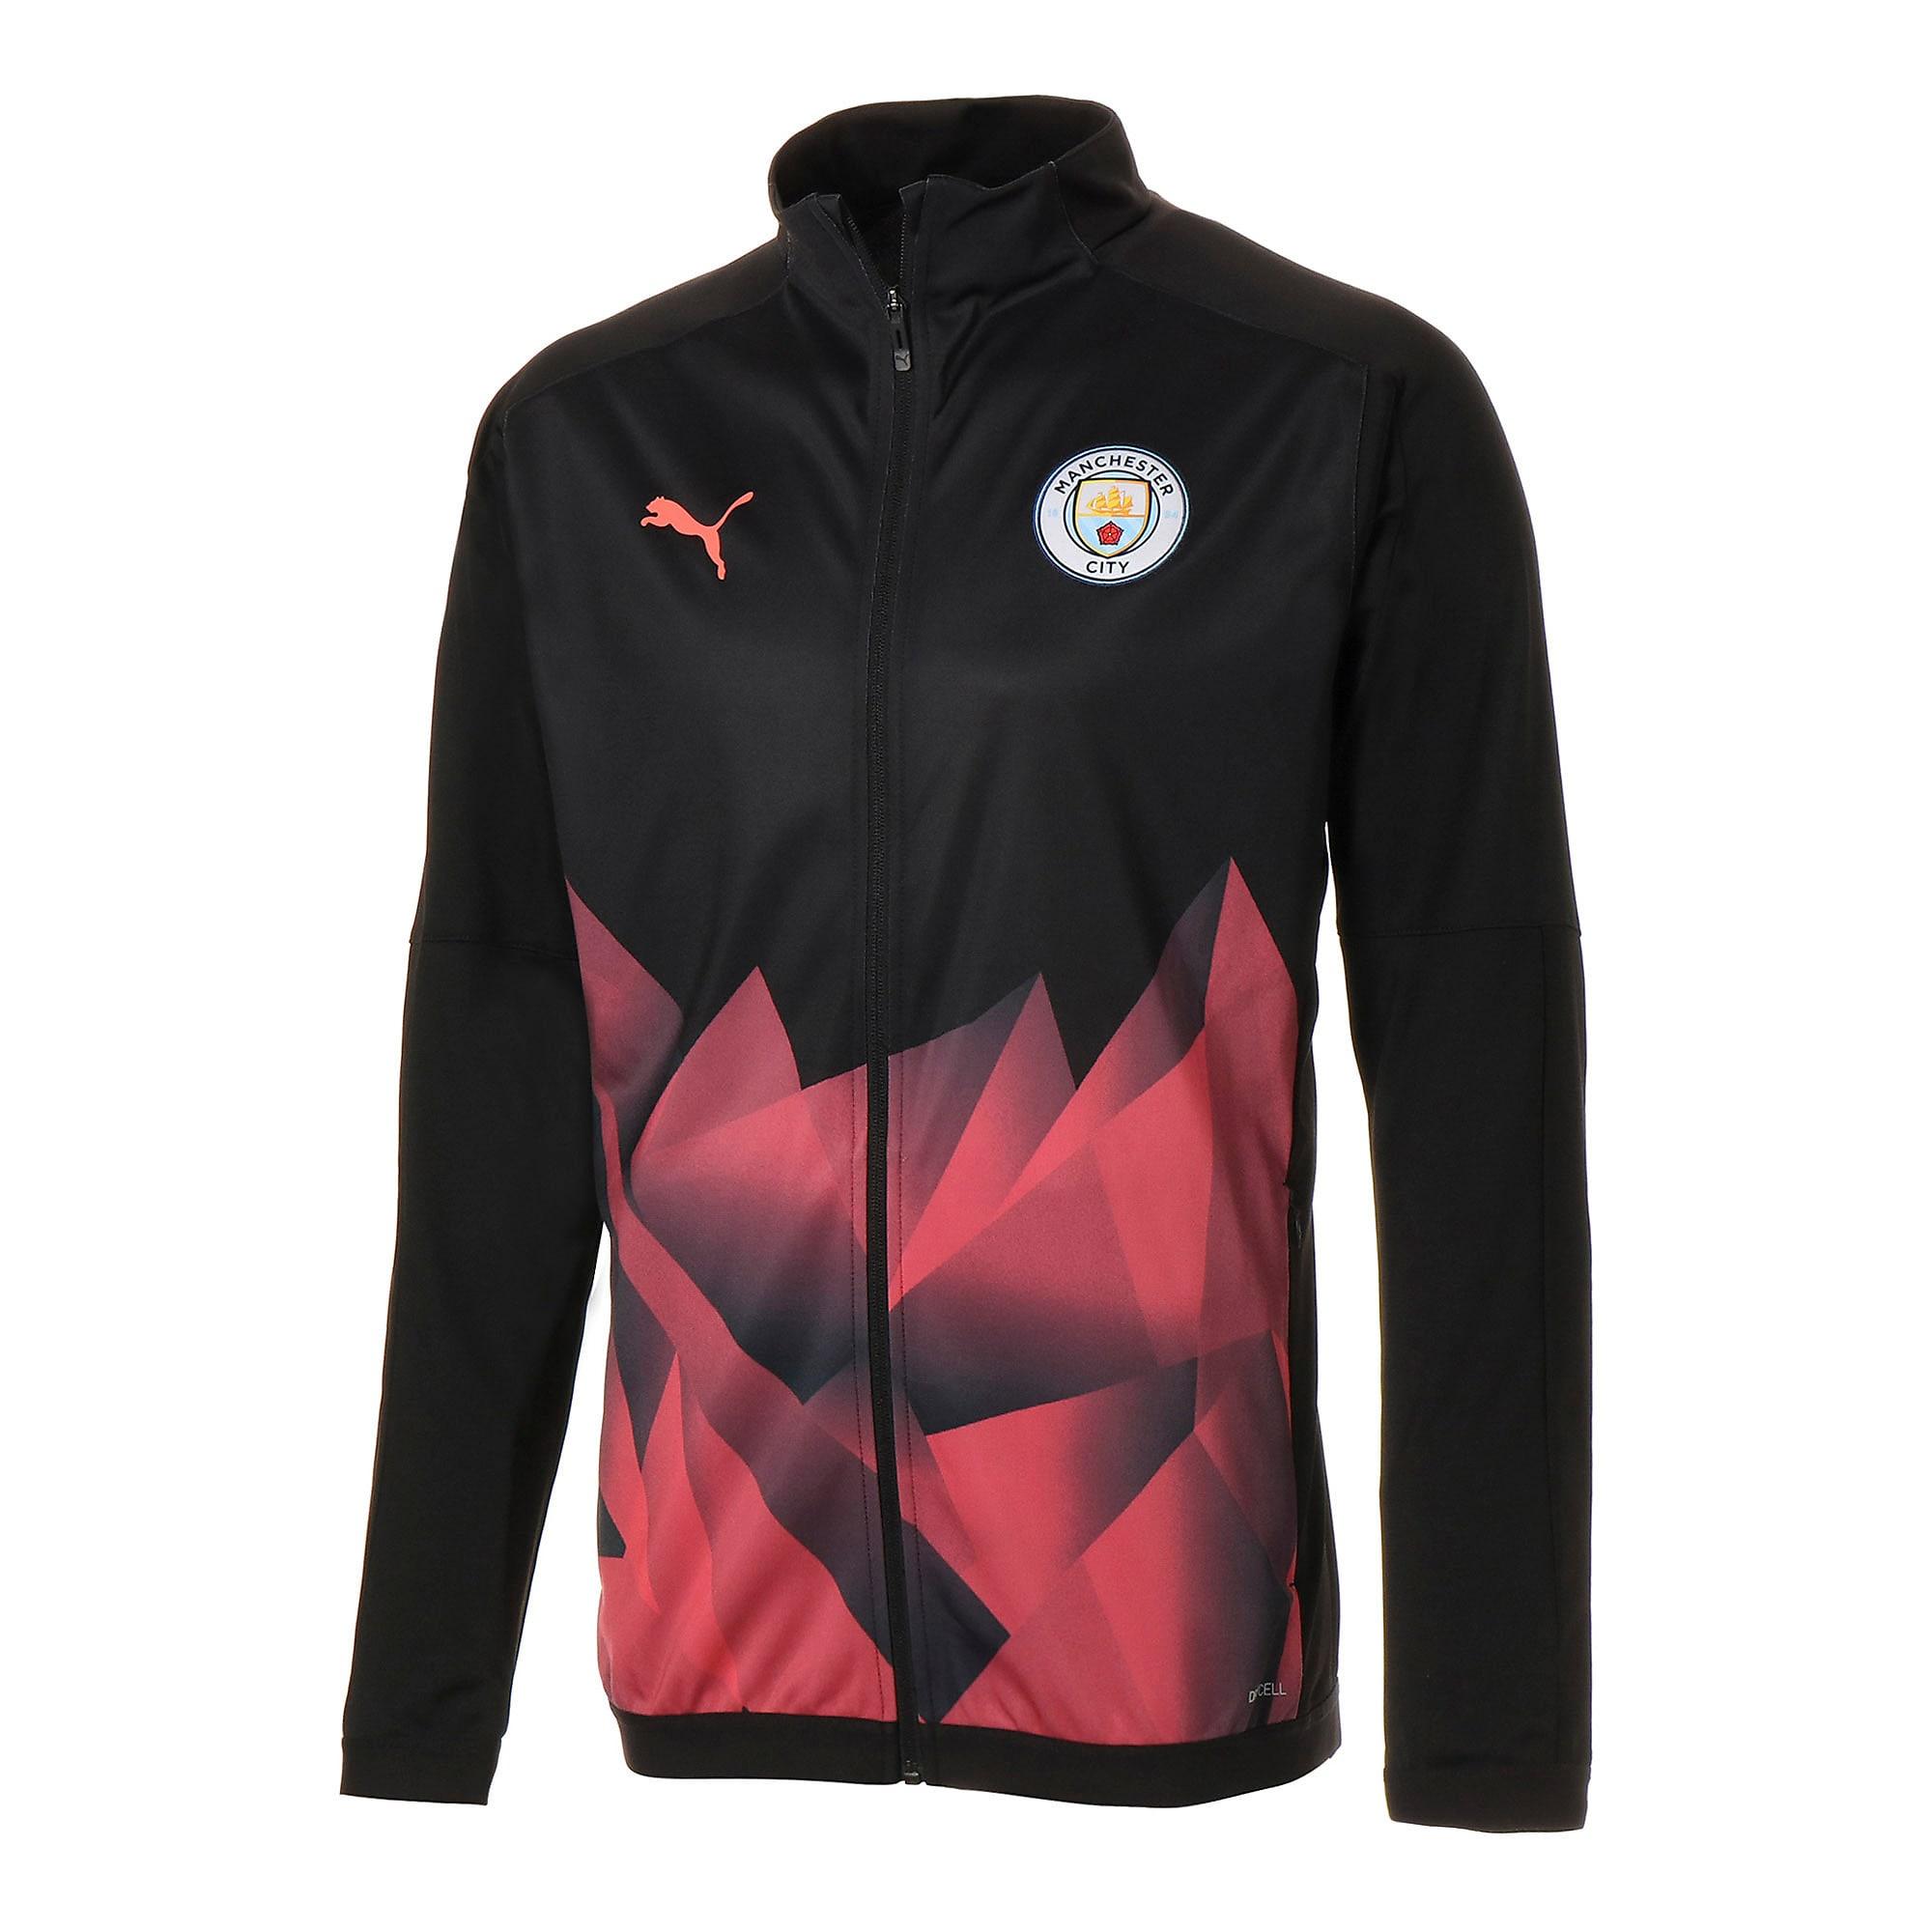 new products e7579 c5c21 Man City Men's International Stadium Jacket